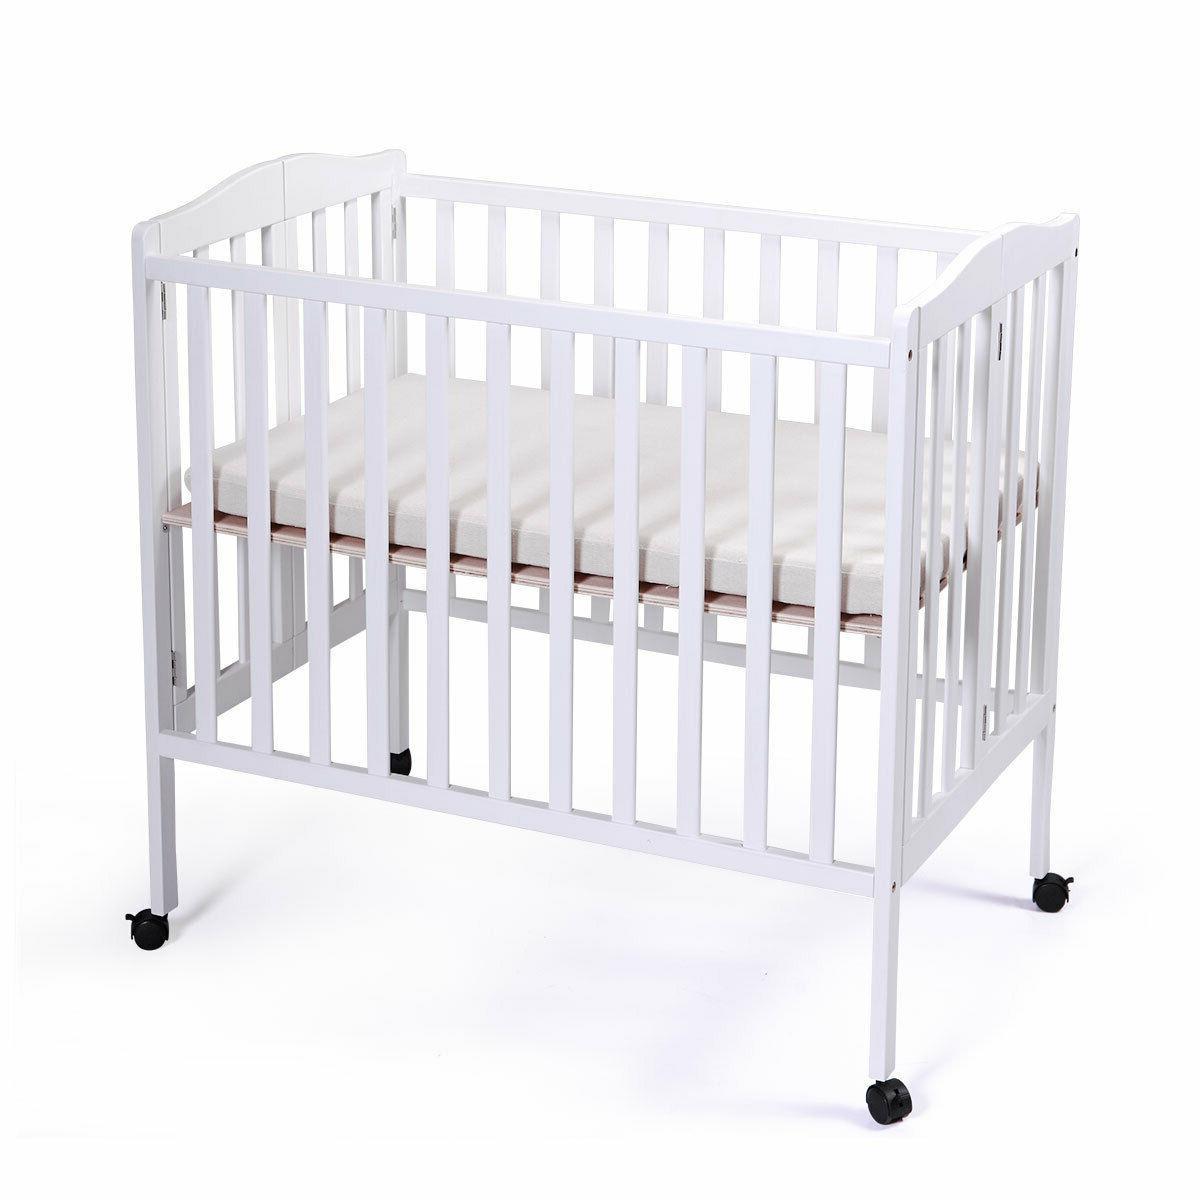 TOBBI-SAFE Nursery Bed Wood Infant Newborn